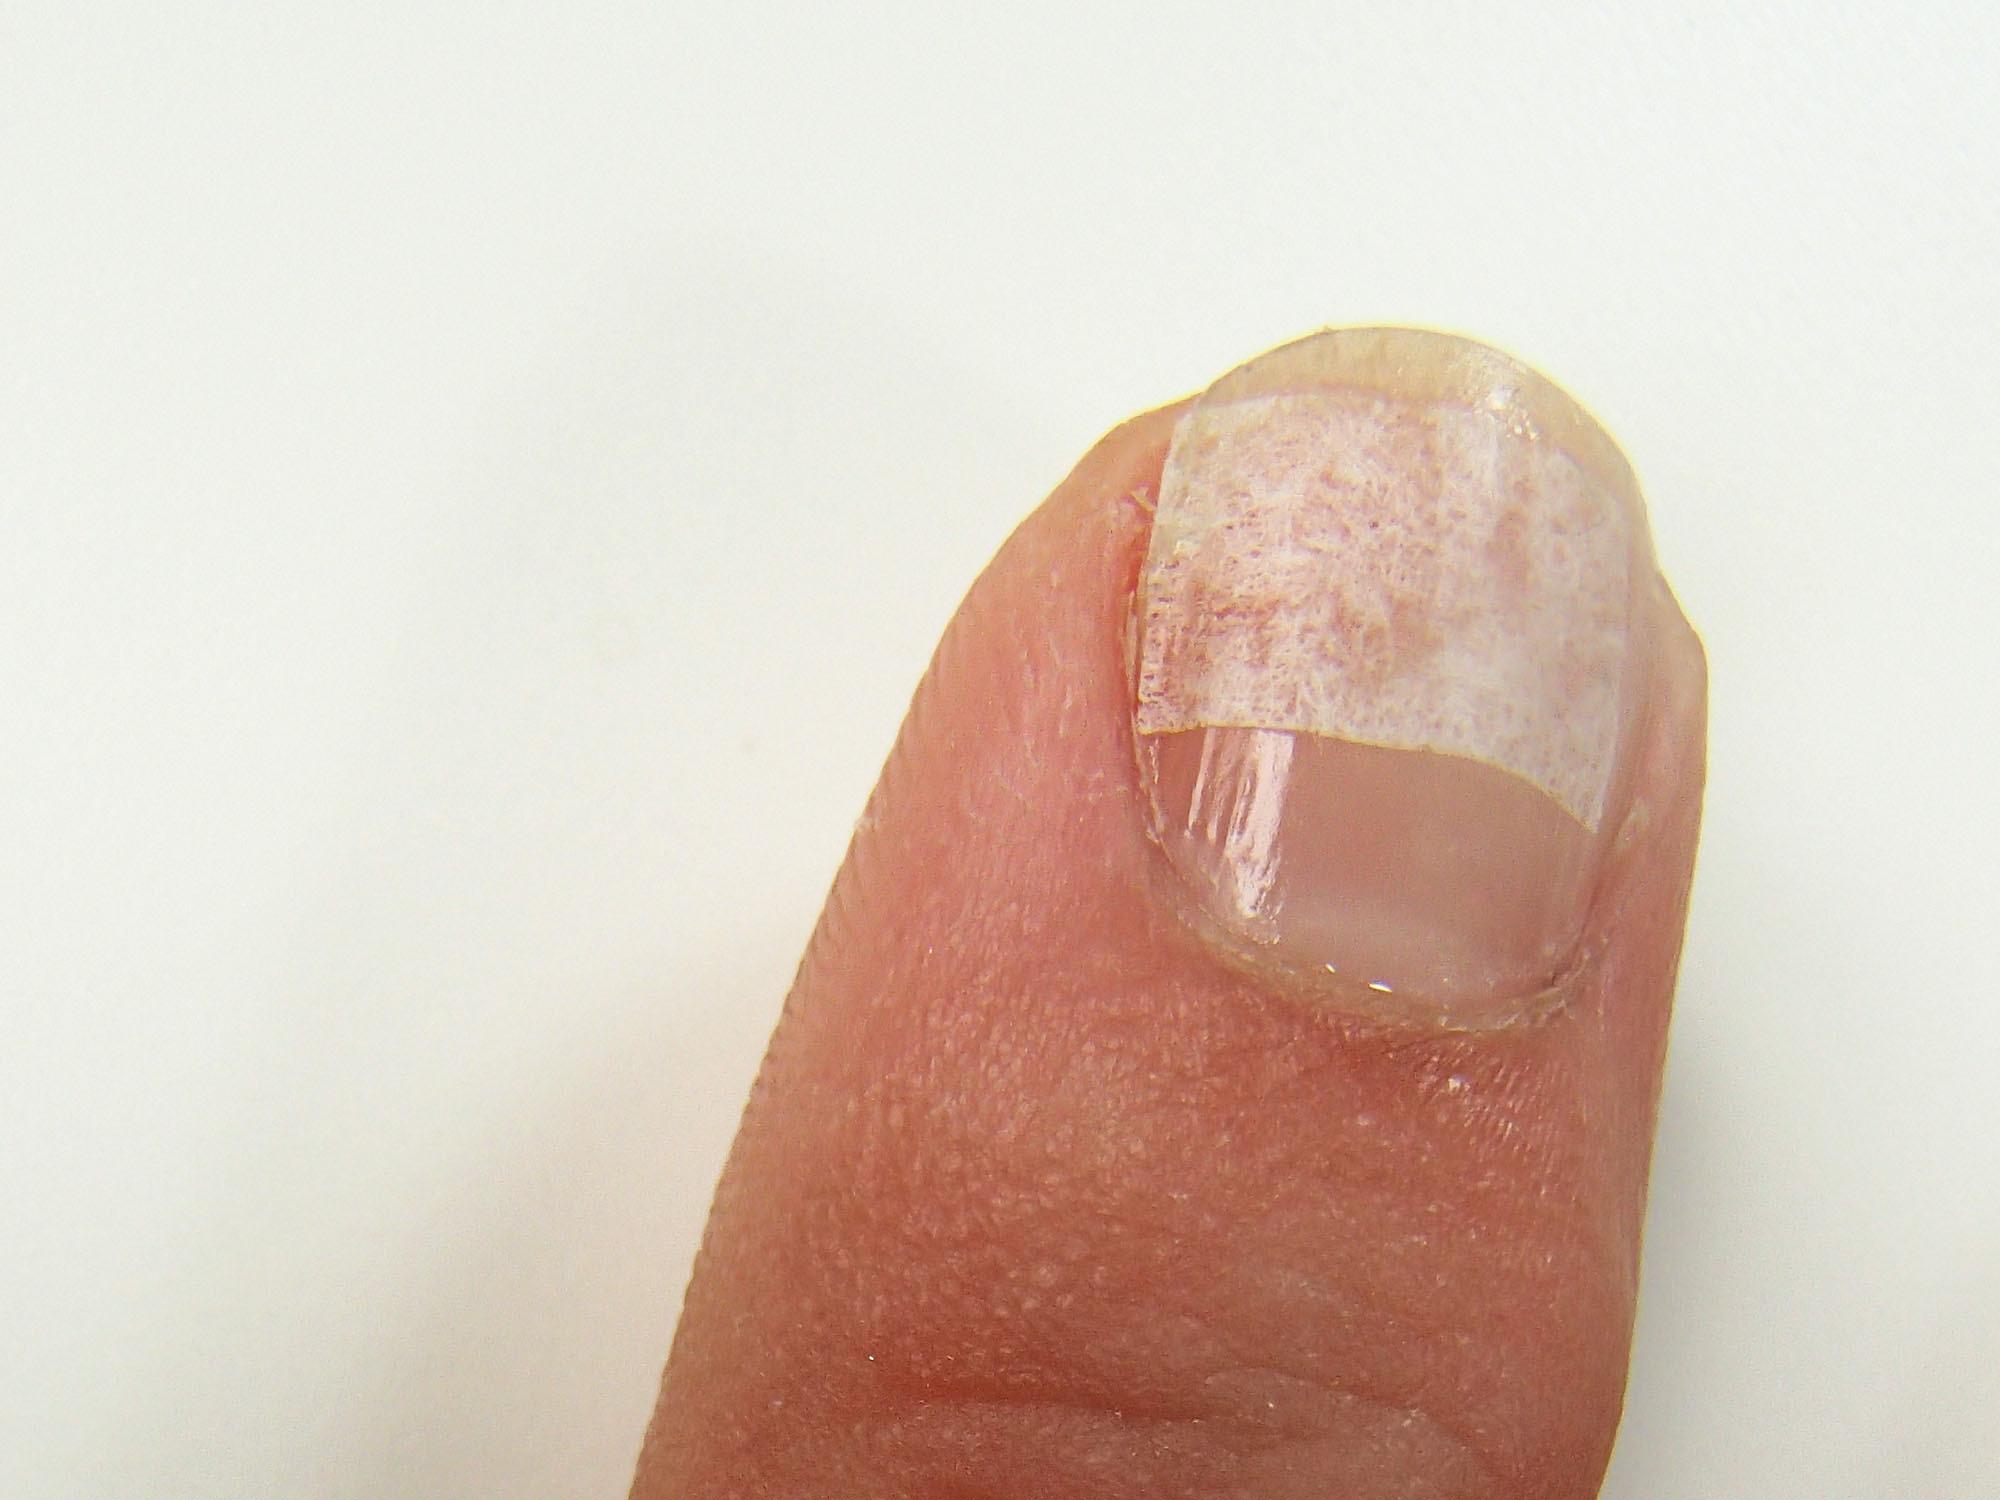 Quick & easy way to bandage a cracked nail | Lipstick Latitude